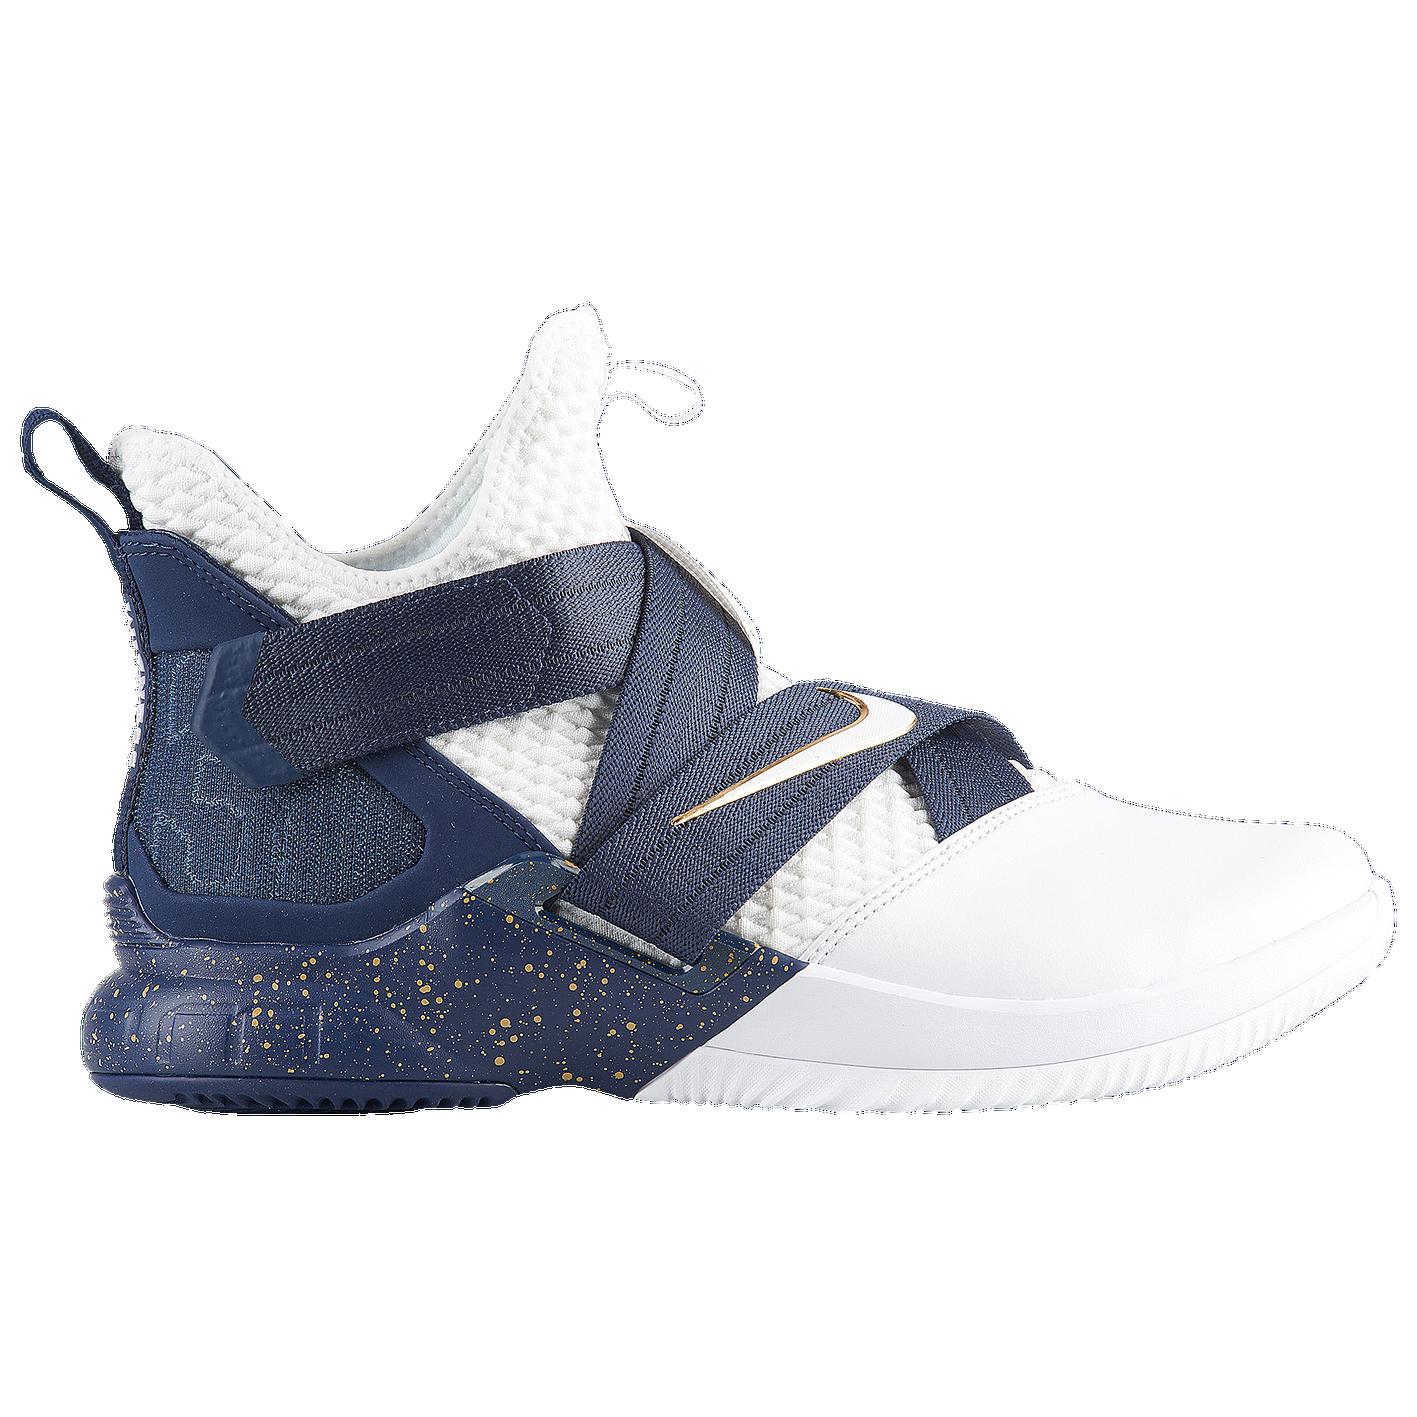 1f0be993752 Nike LeBron Soldier XII SFG - Boys  Preschool - Basketball - Shoes ...